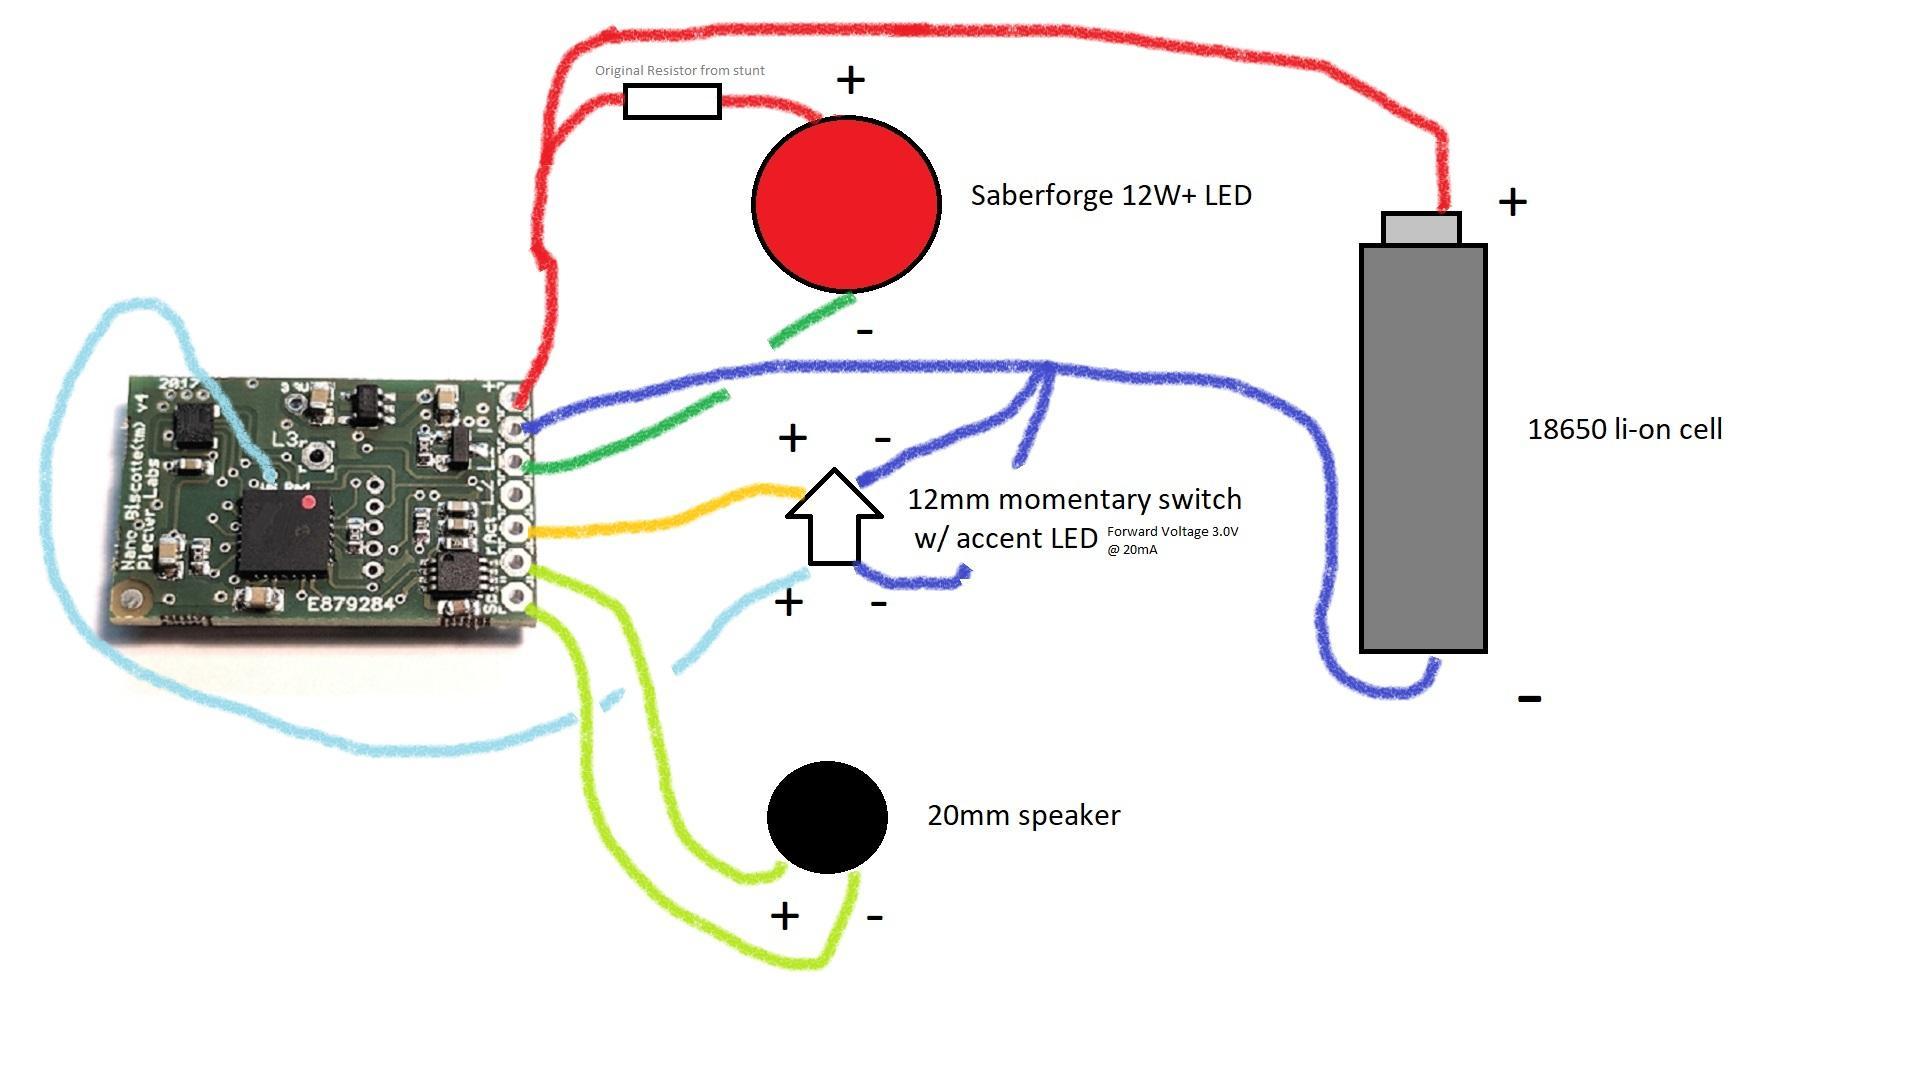 Lightsaber Battery Wiring Diagram | Wiring Library - Nano Biscotte V4 Wiring Diagram